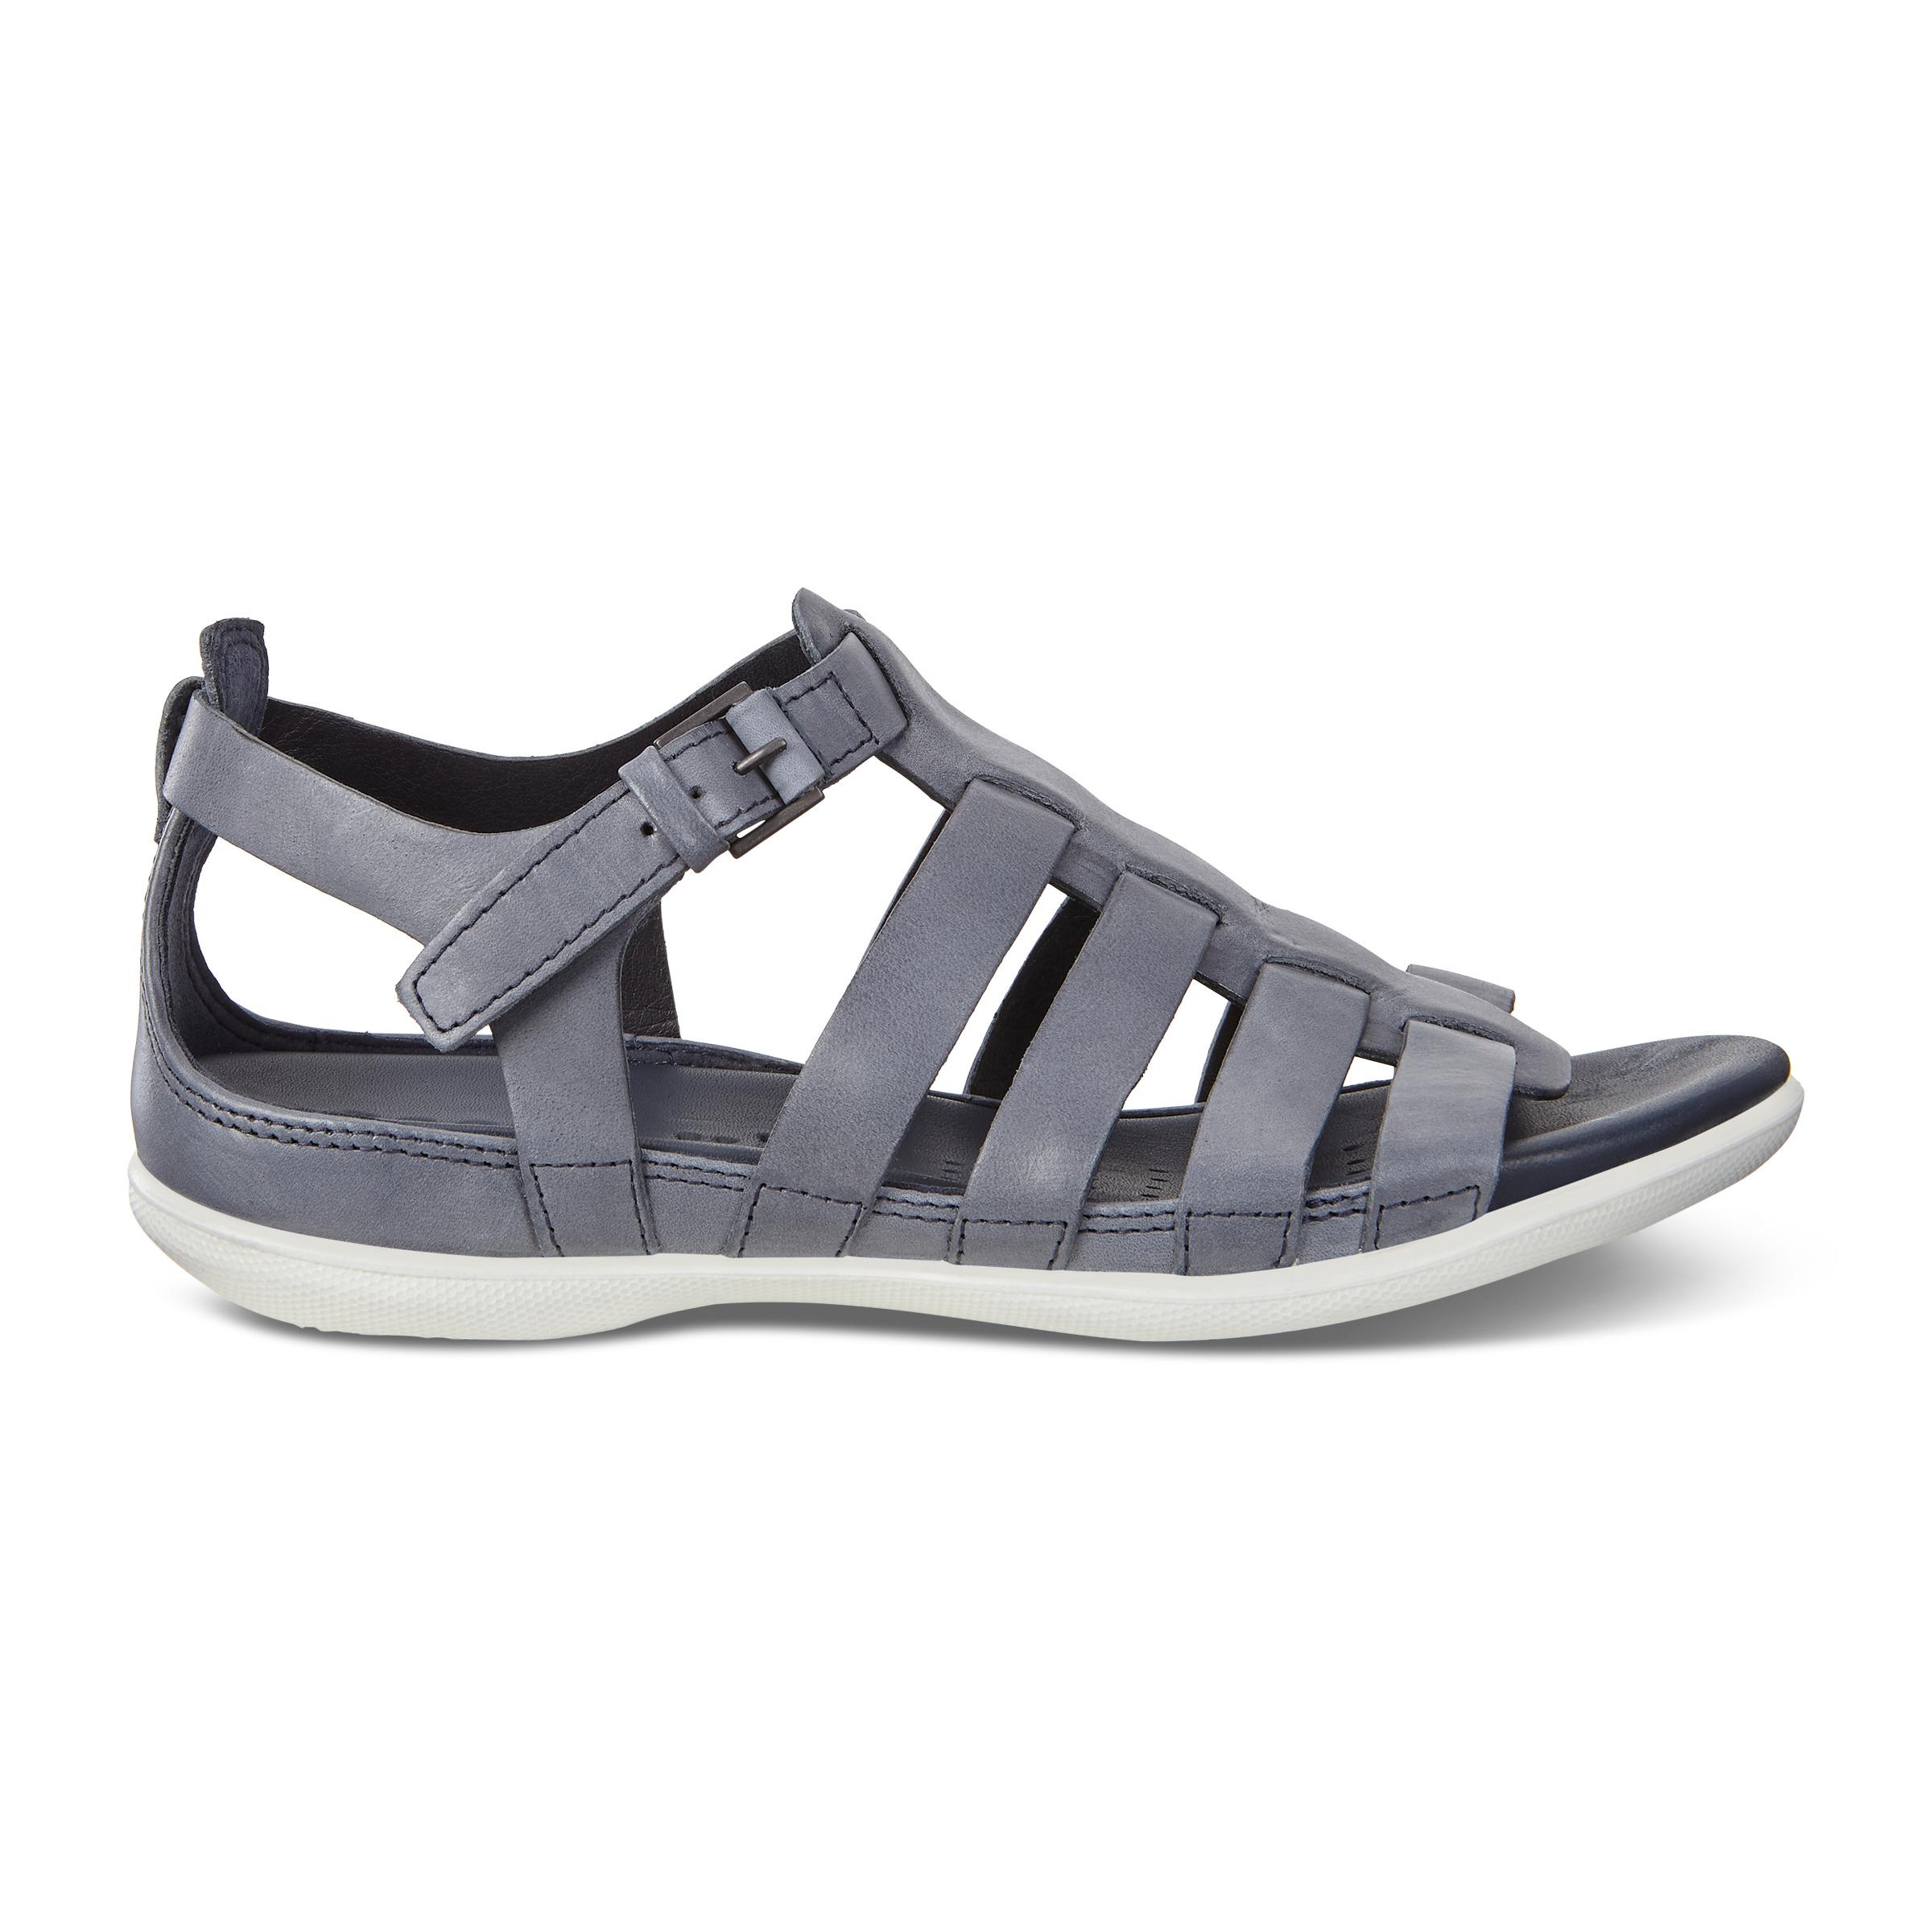 ECCO Flash Flat Sandal Size 10-10.5 Marine